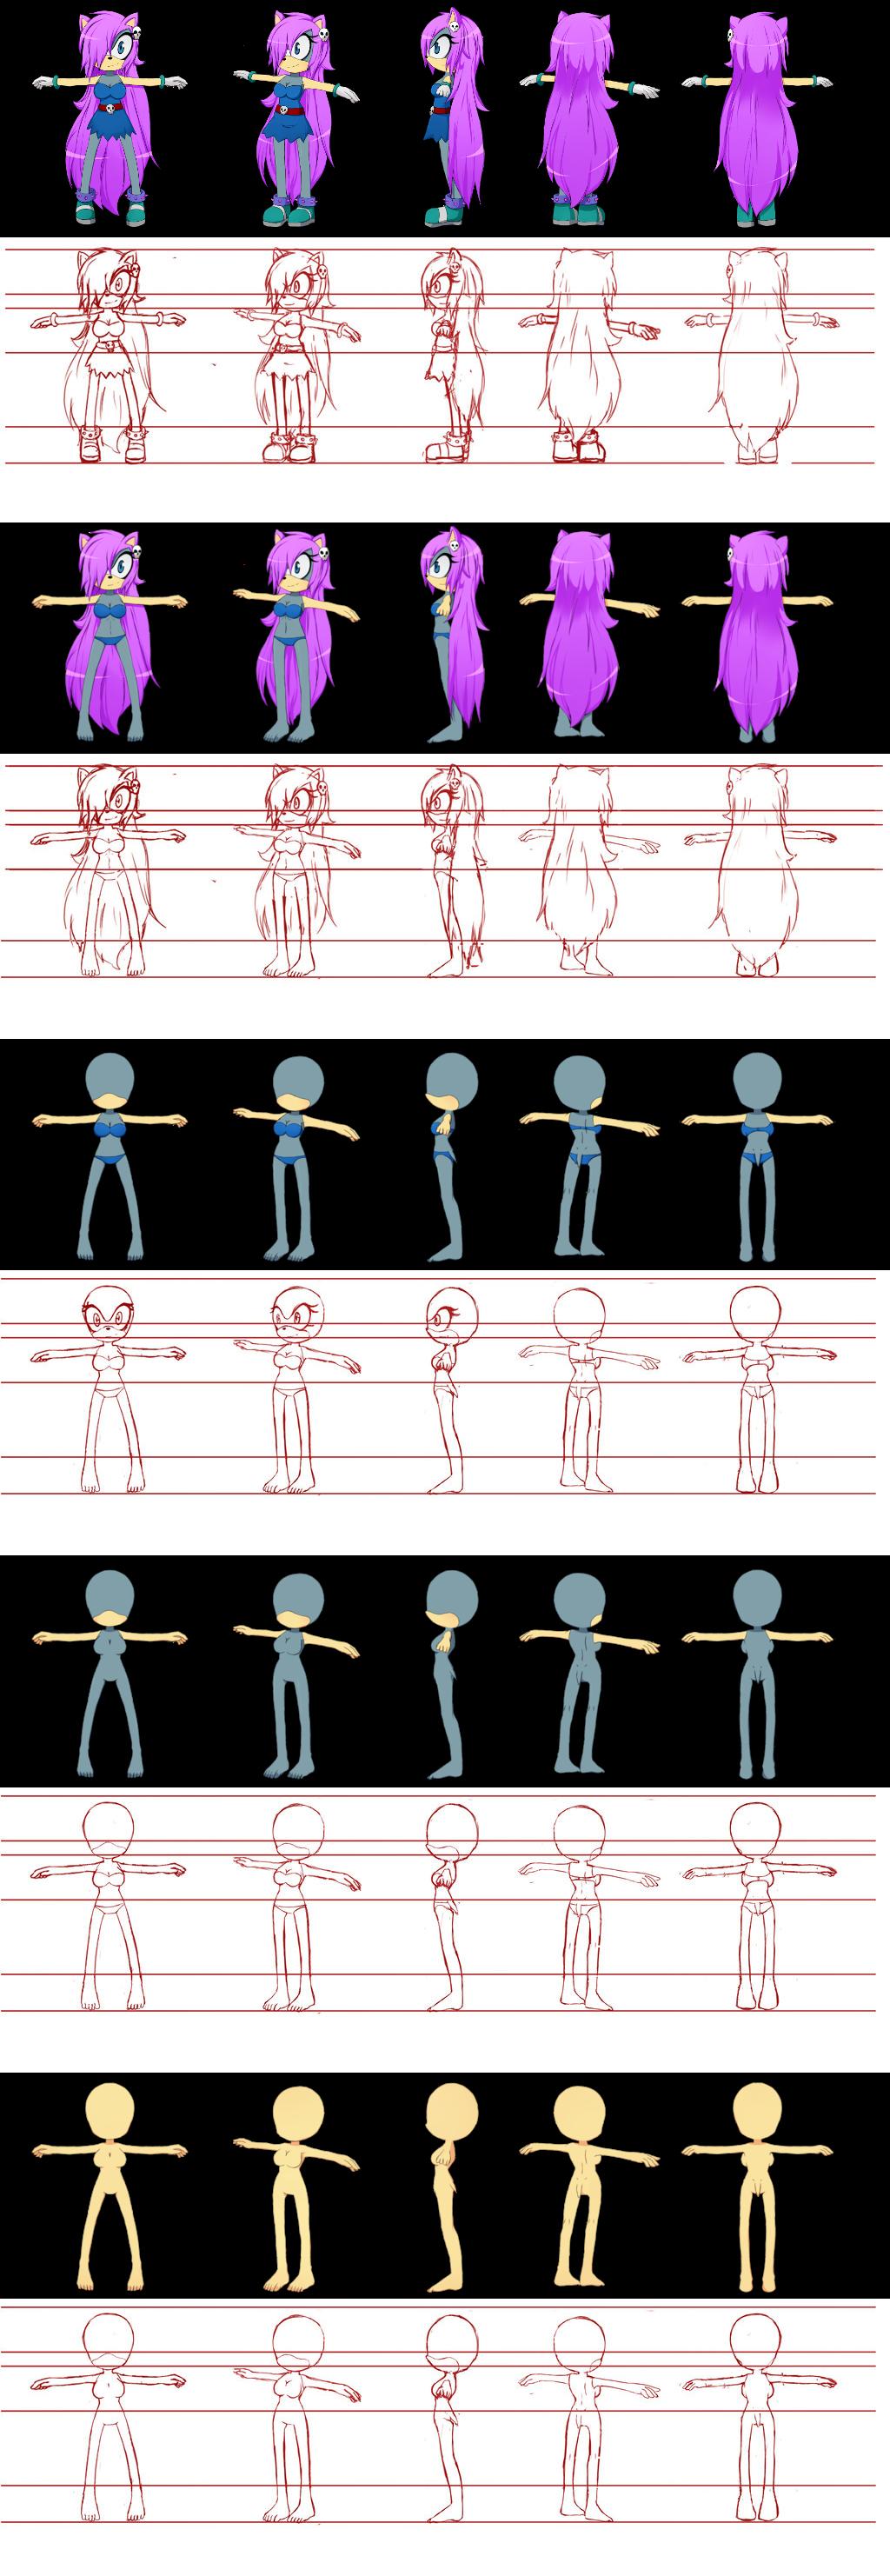 characters model sheet tutorial by klonoafanworkassets on deviantart